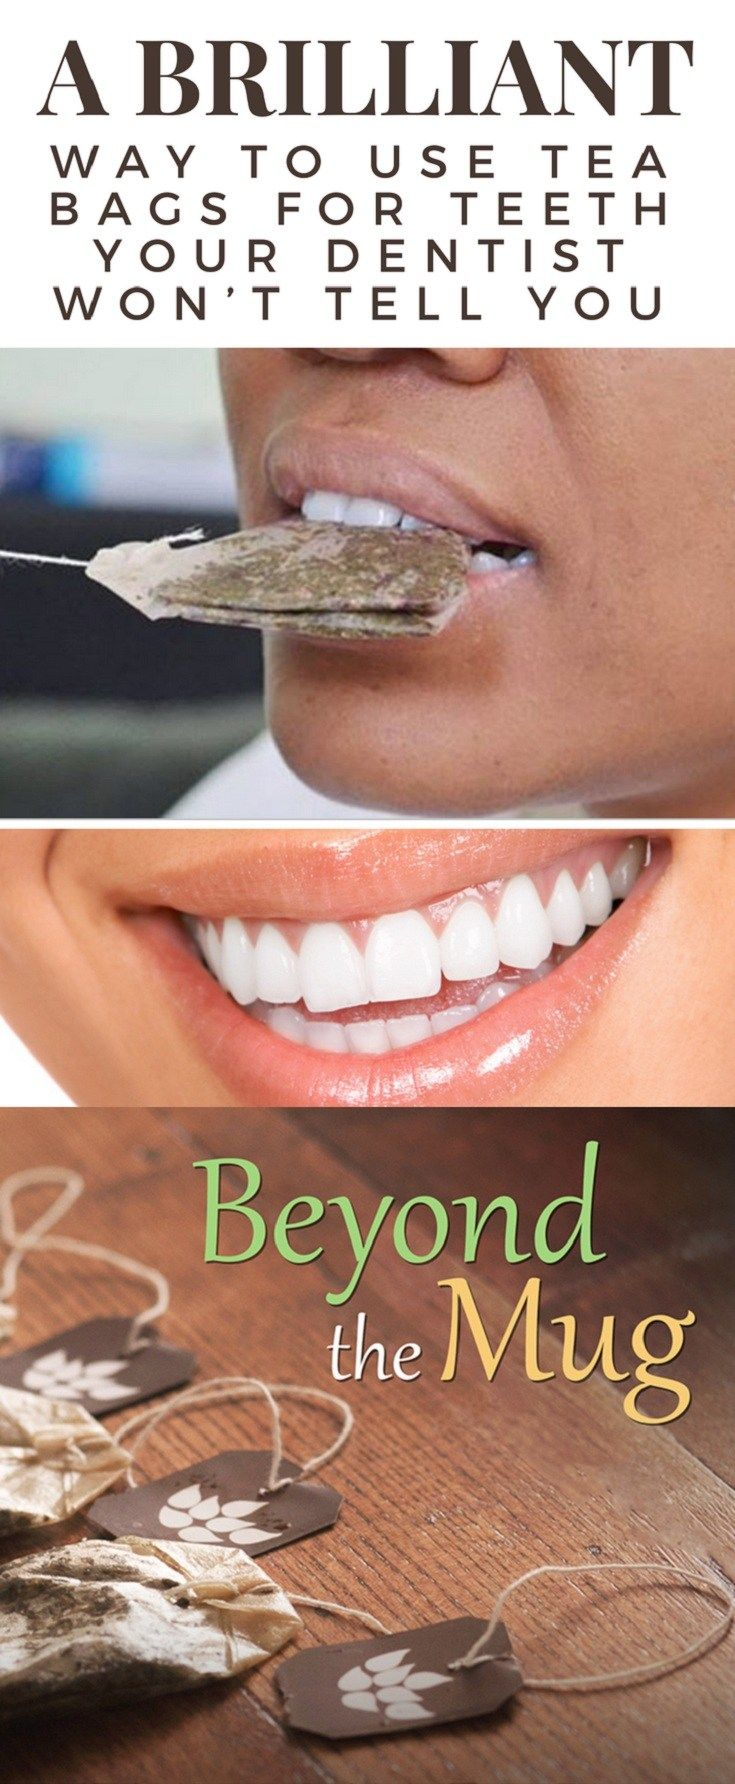 A BRILLIANT WAY TO USE TEA BAGS FOR TEETH YOUR DENTIST WON'T TELL YOU #teeth #health #beauty #tea